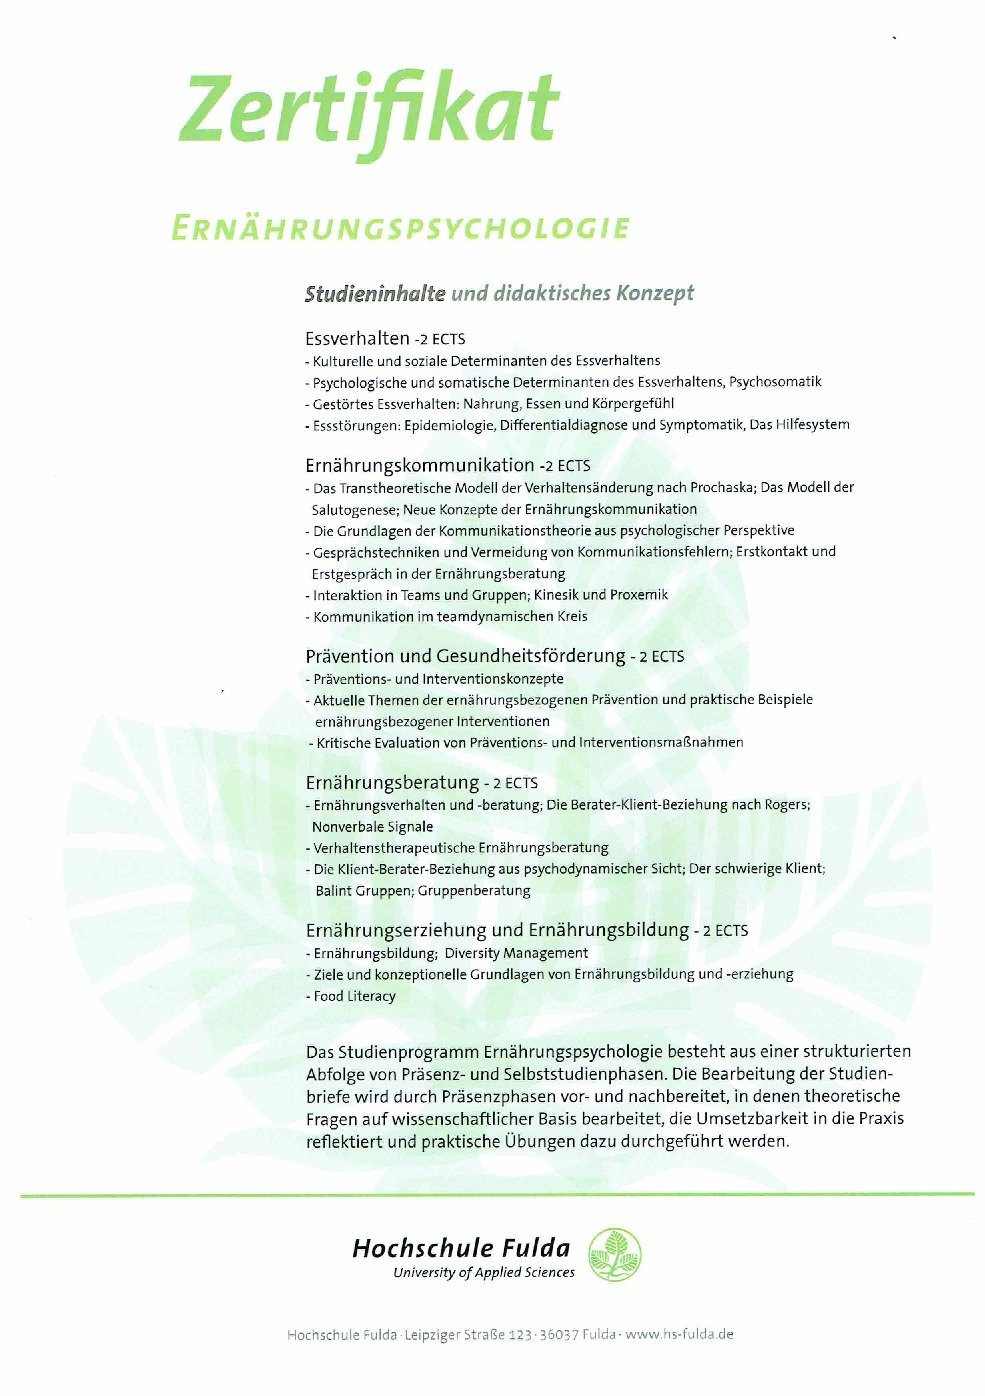 Zertifikat Ernährungspsychologie